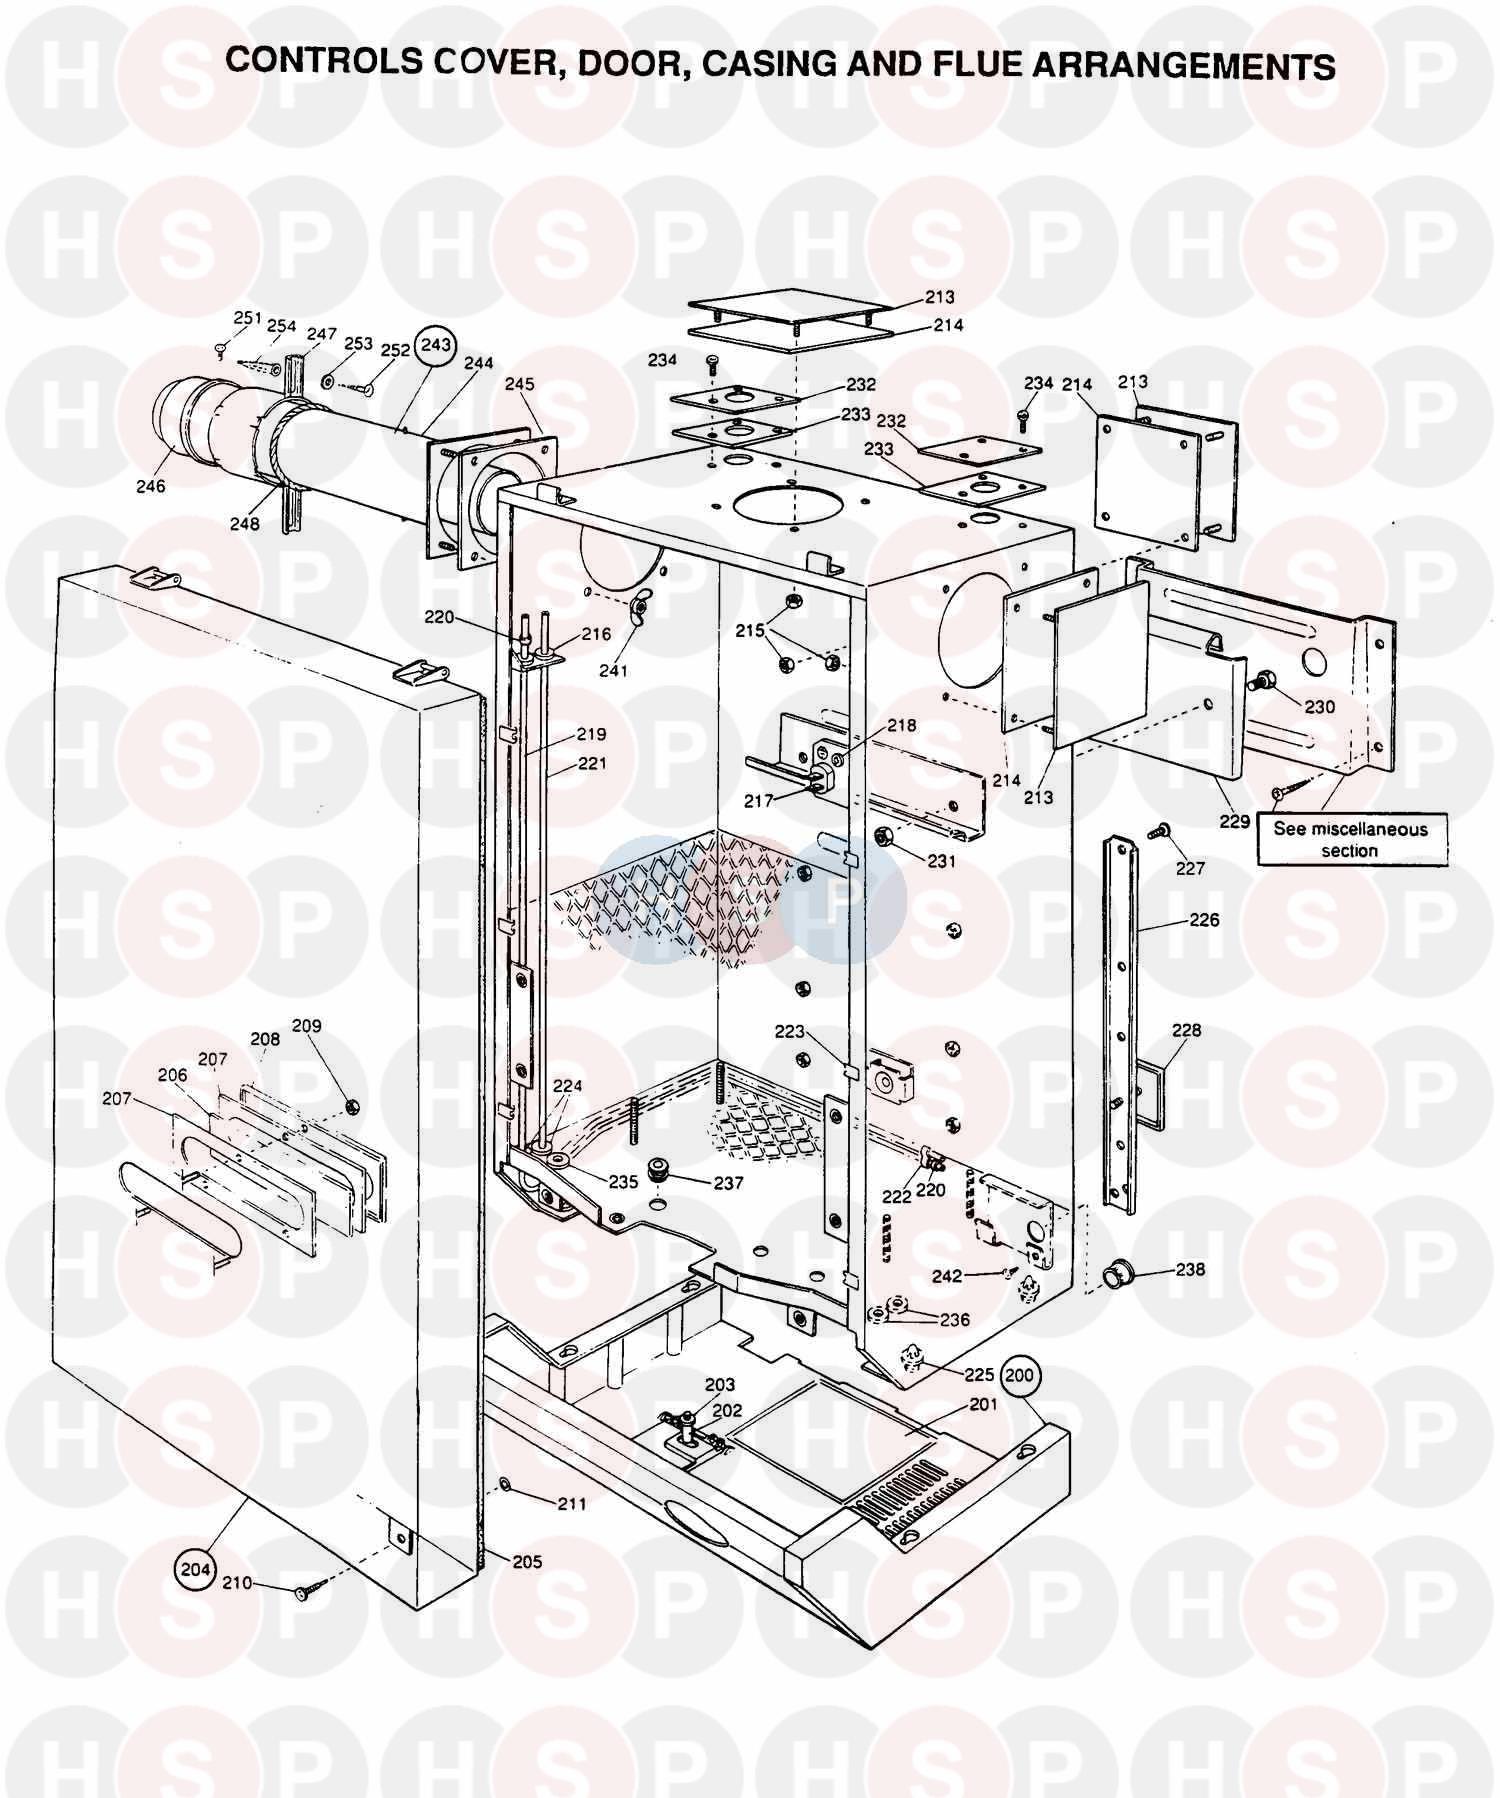 Potterton powermax he 85 user instructions pdf download.